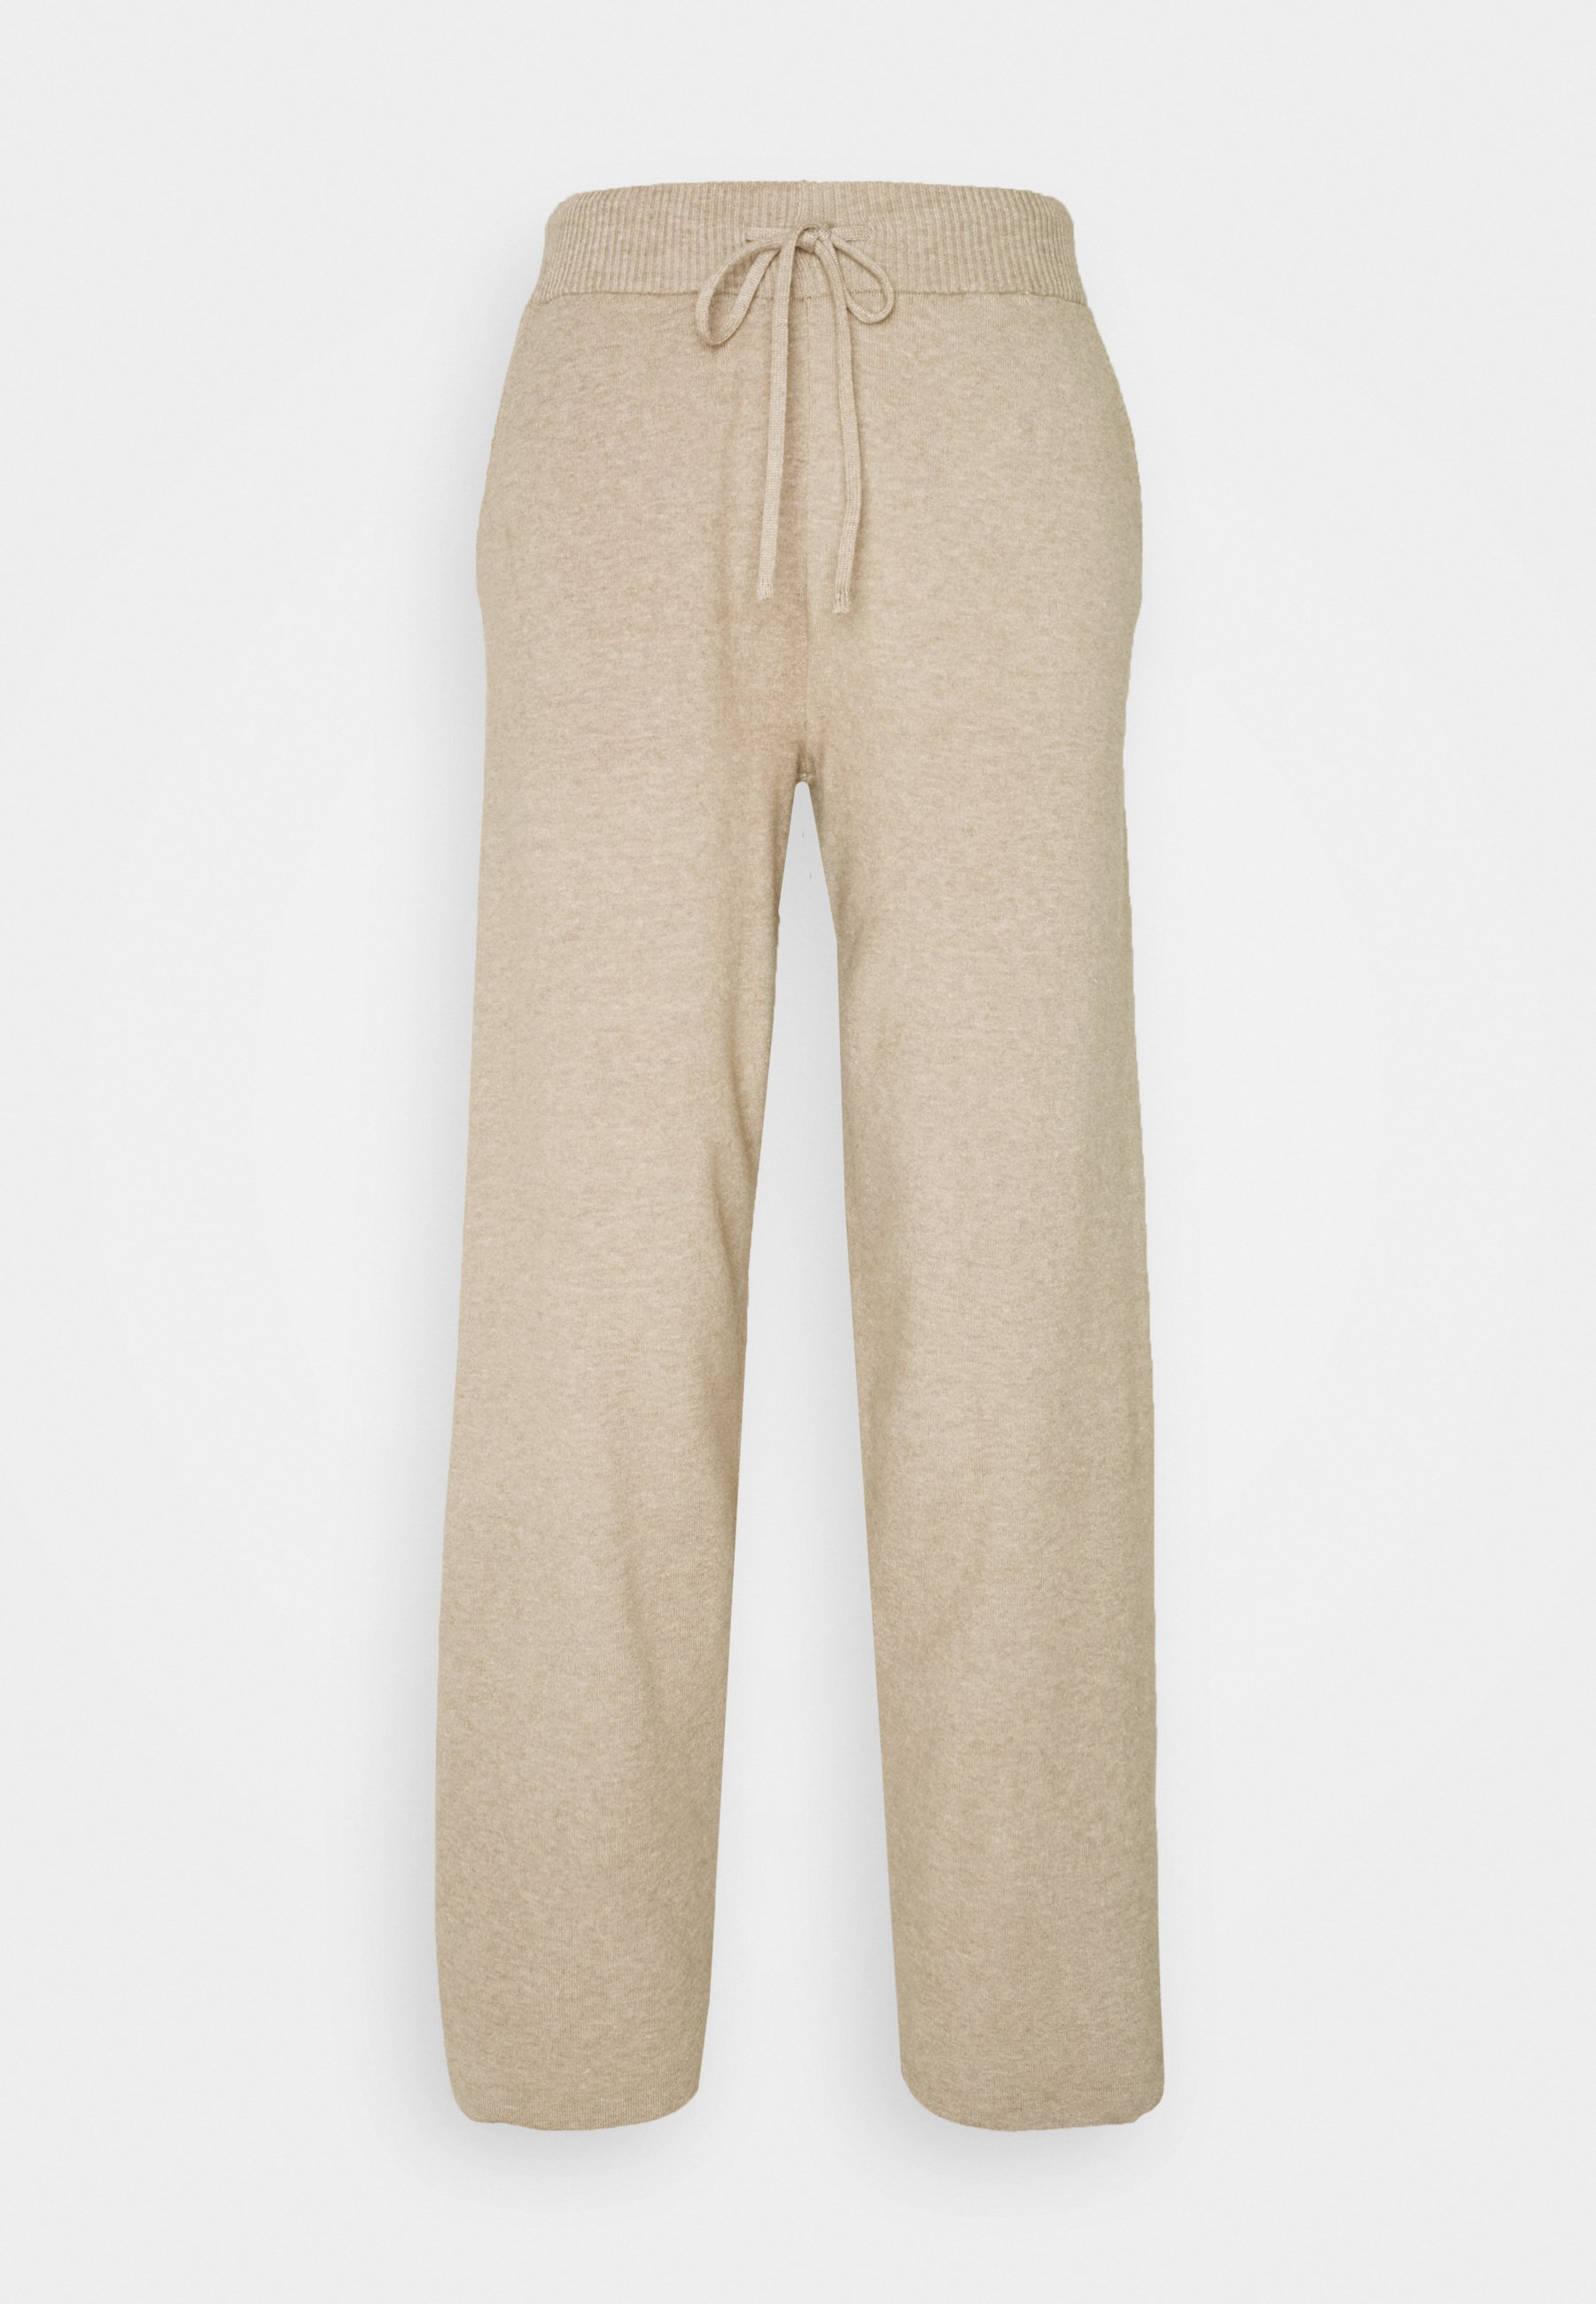 KNIT LOUNGE PANT Bukse mottled dark brown